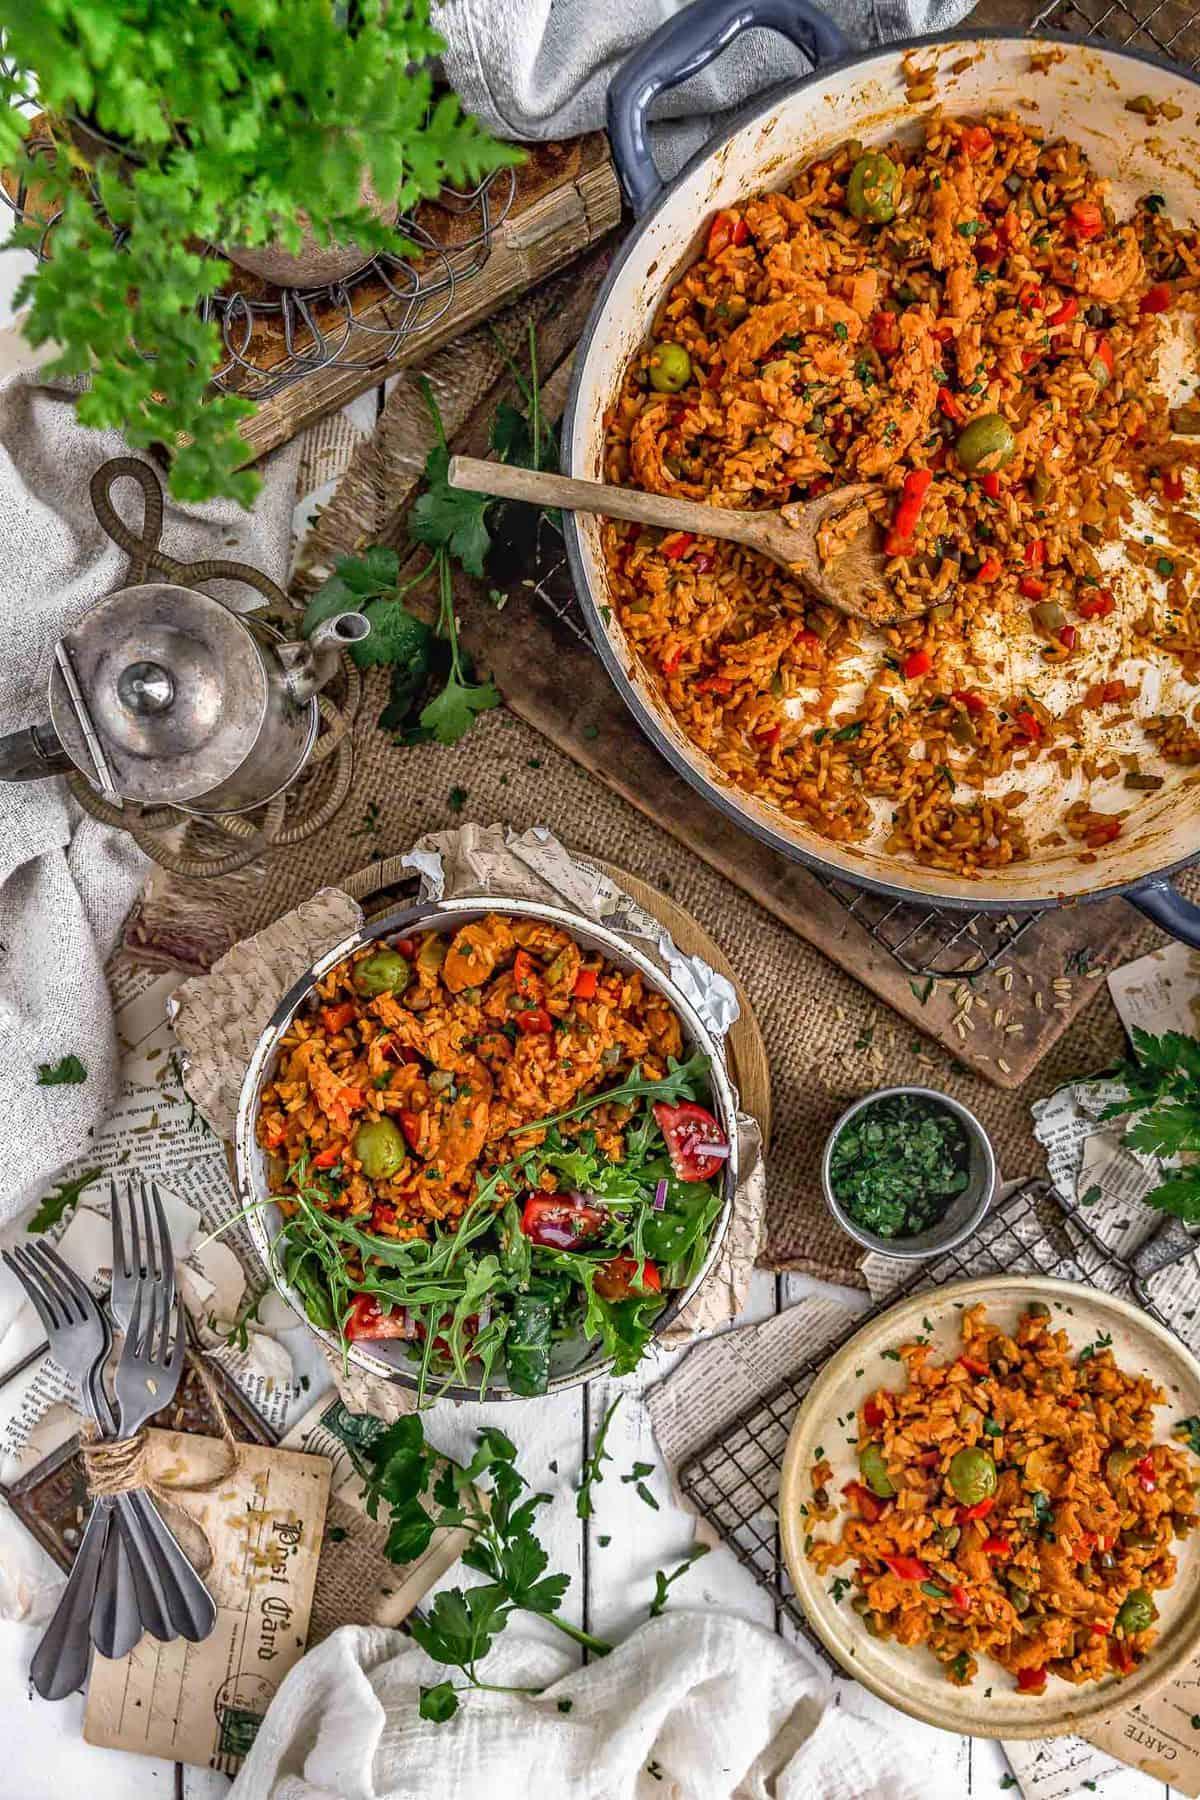 Tablescape of Vegan Arroz on Pollo